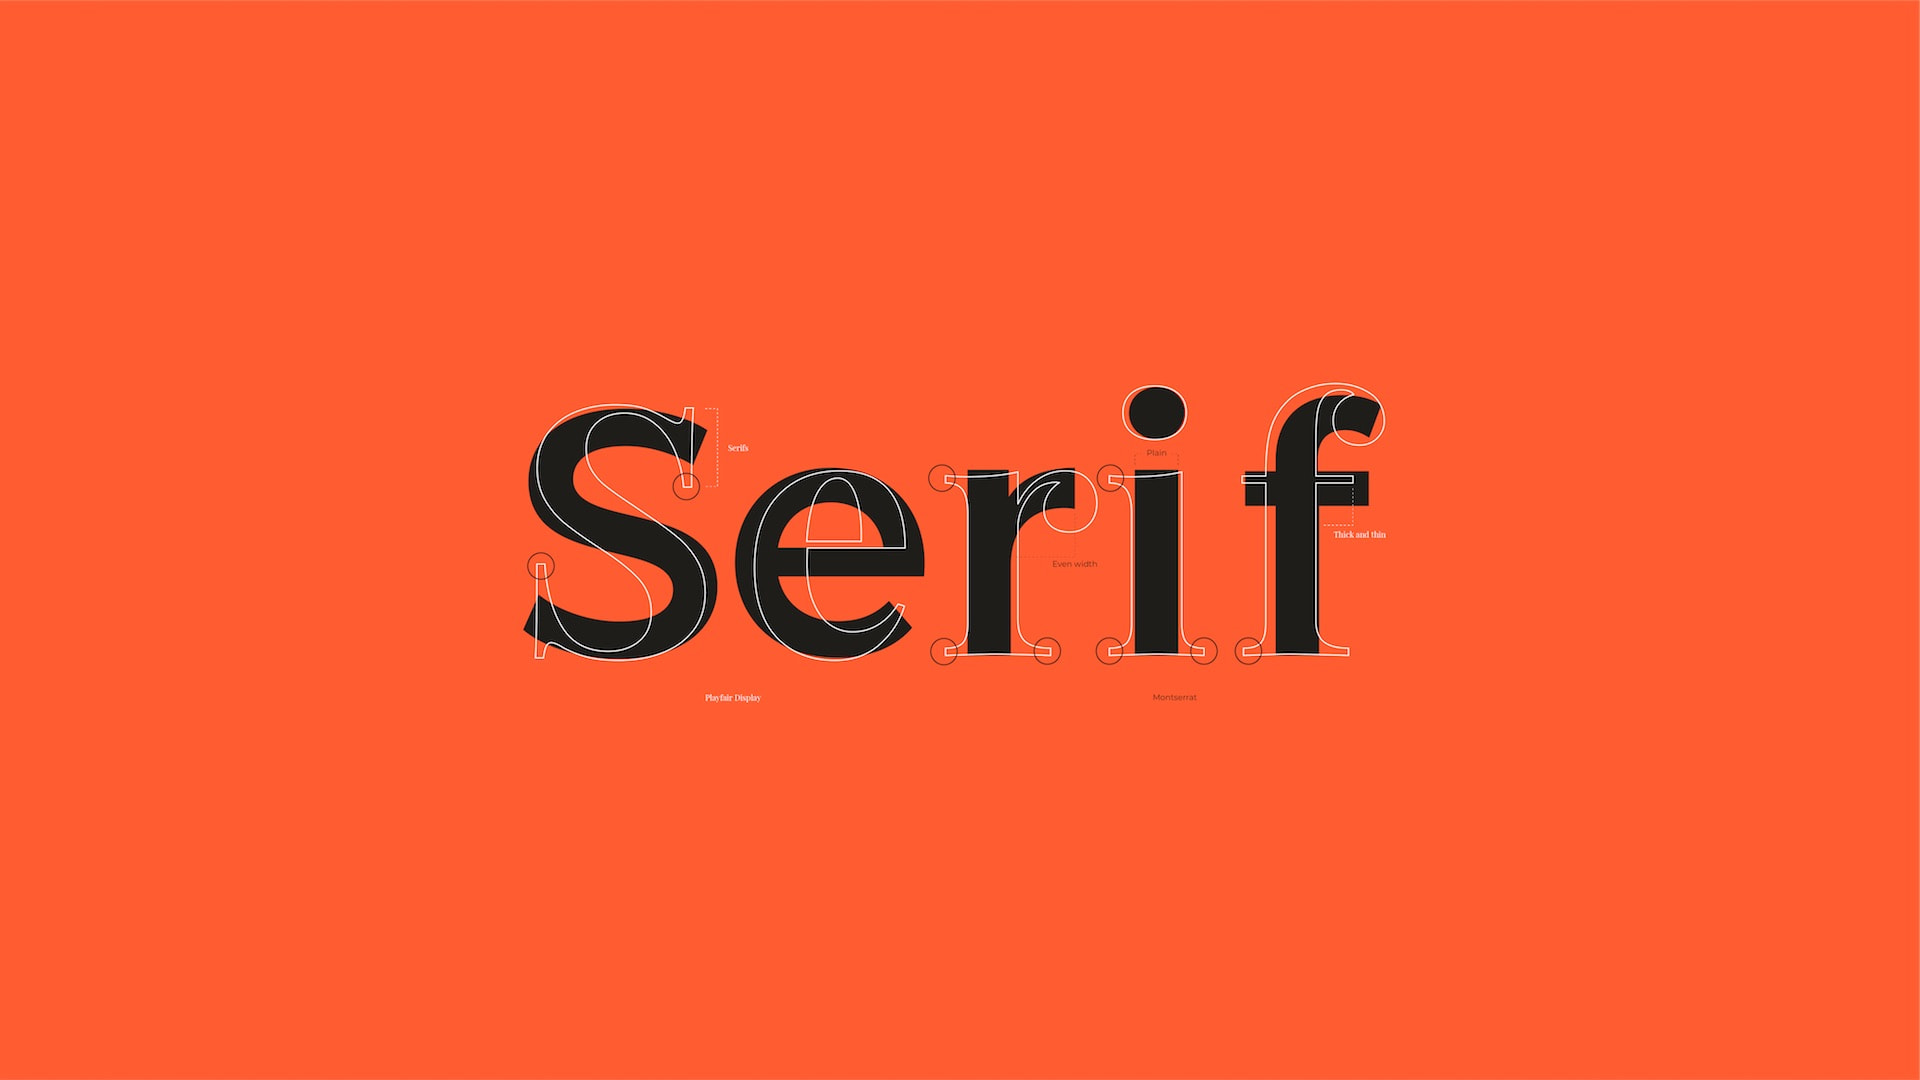 Serif-vs-Sans-Serif-Featured-Image